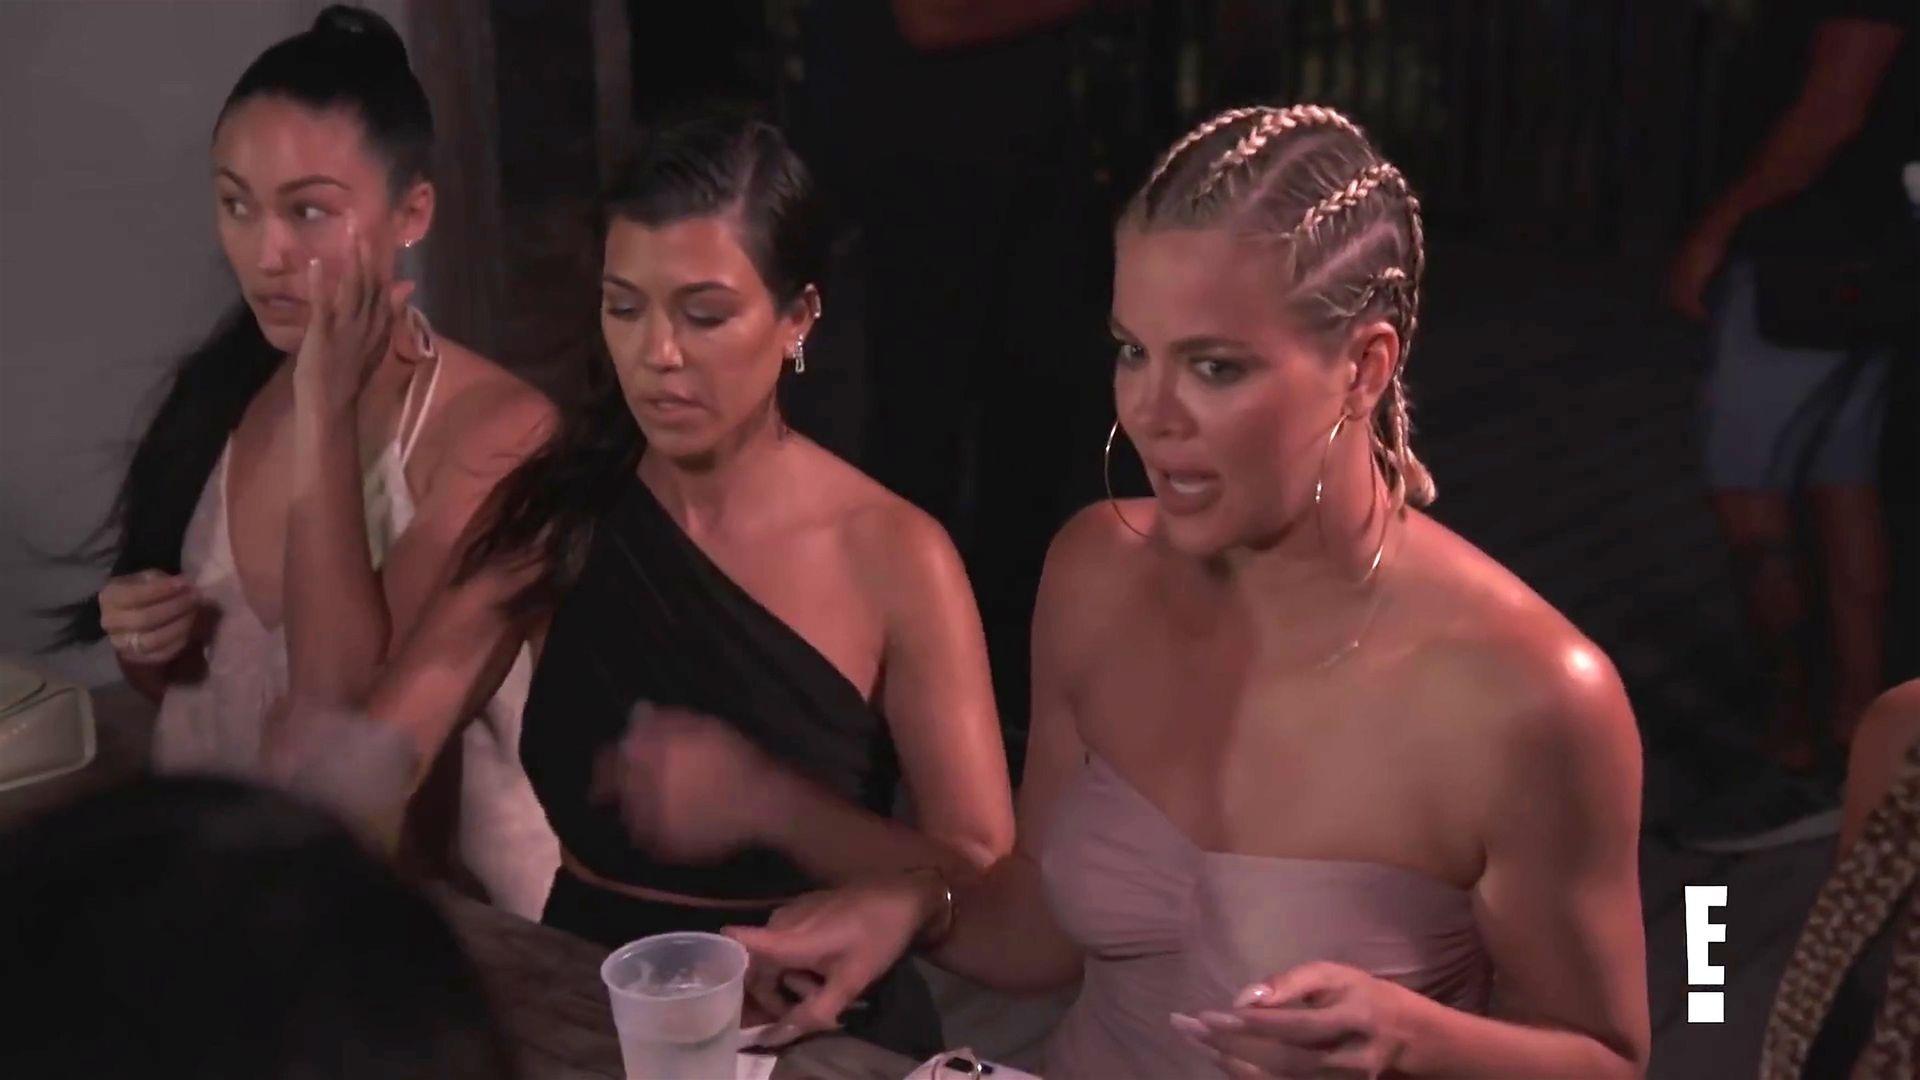 Khloé Kardashian Gets A Little Cold Without A Bra 0023